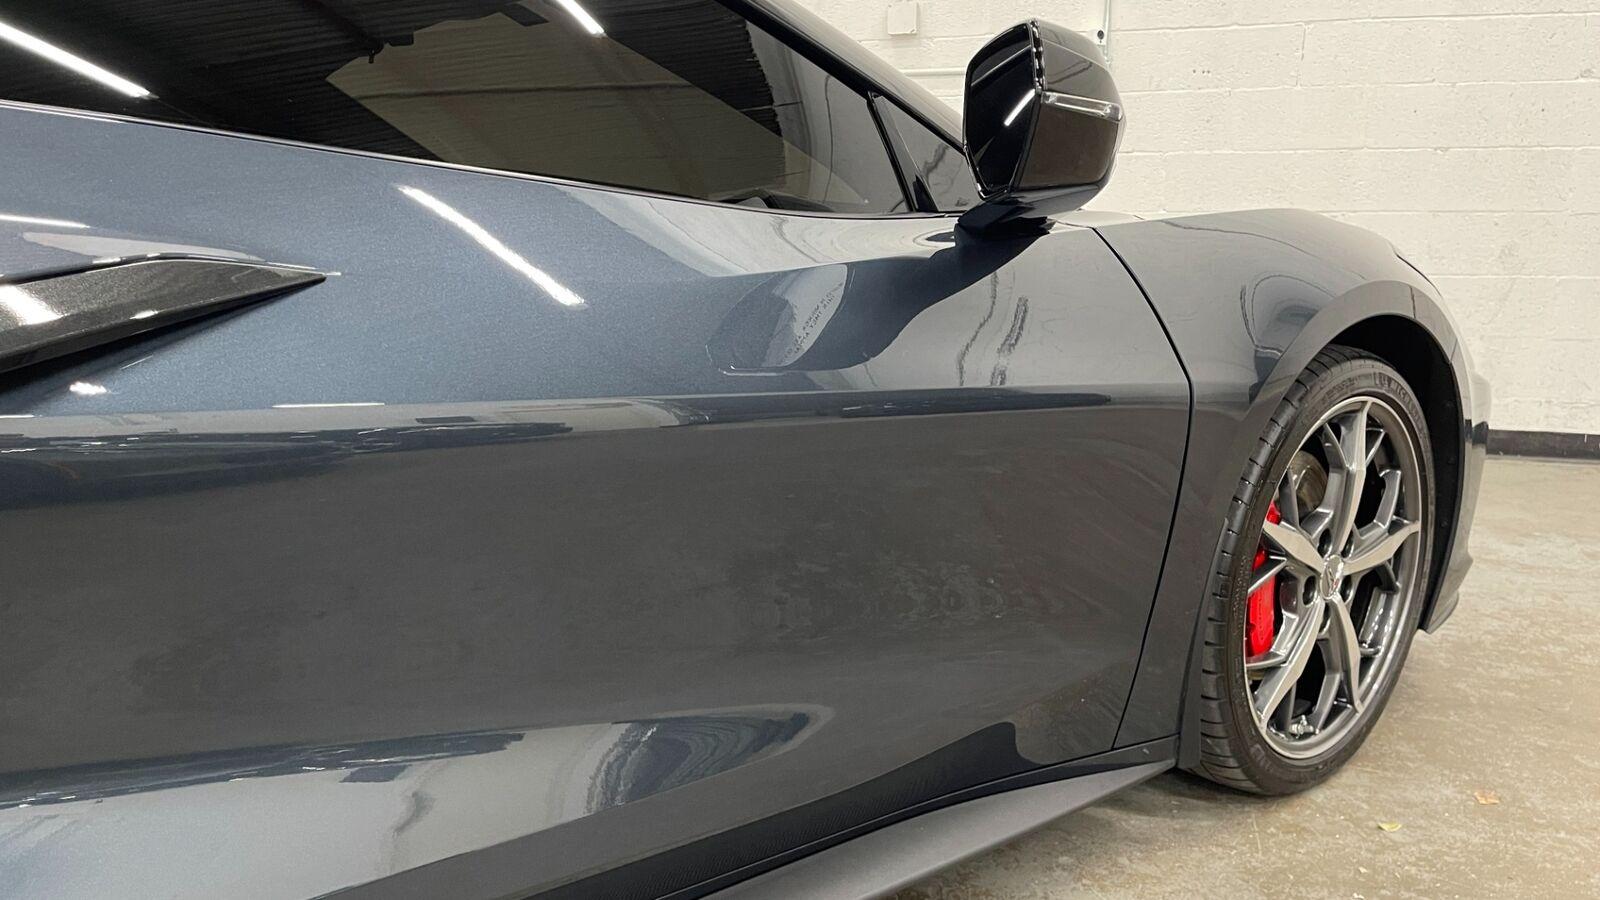 2020 Gray Chevrolet Corvette Stingray 1LT | C7 Corvette Photo 4